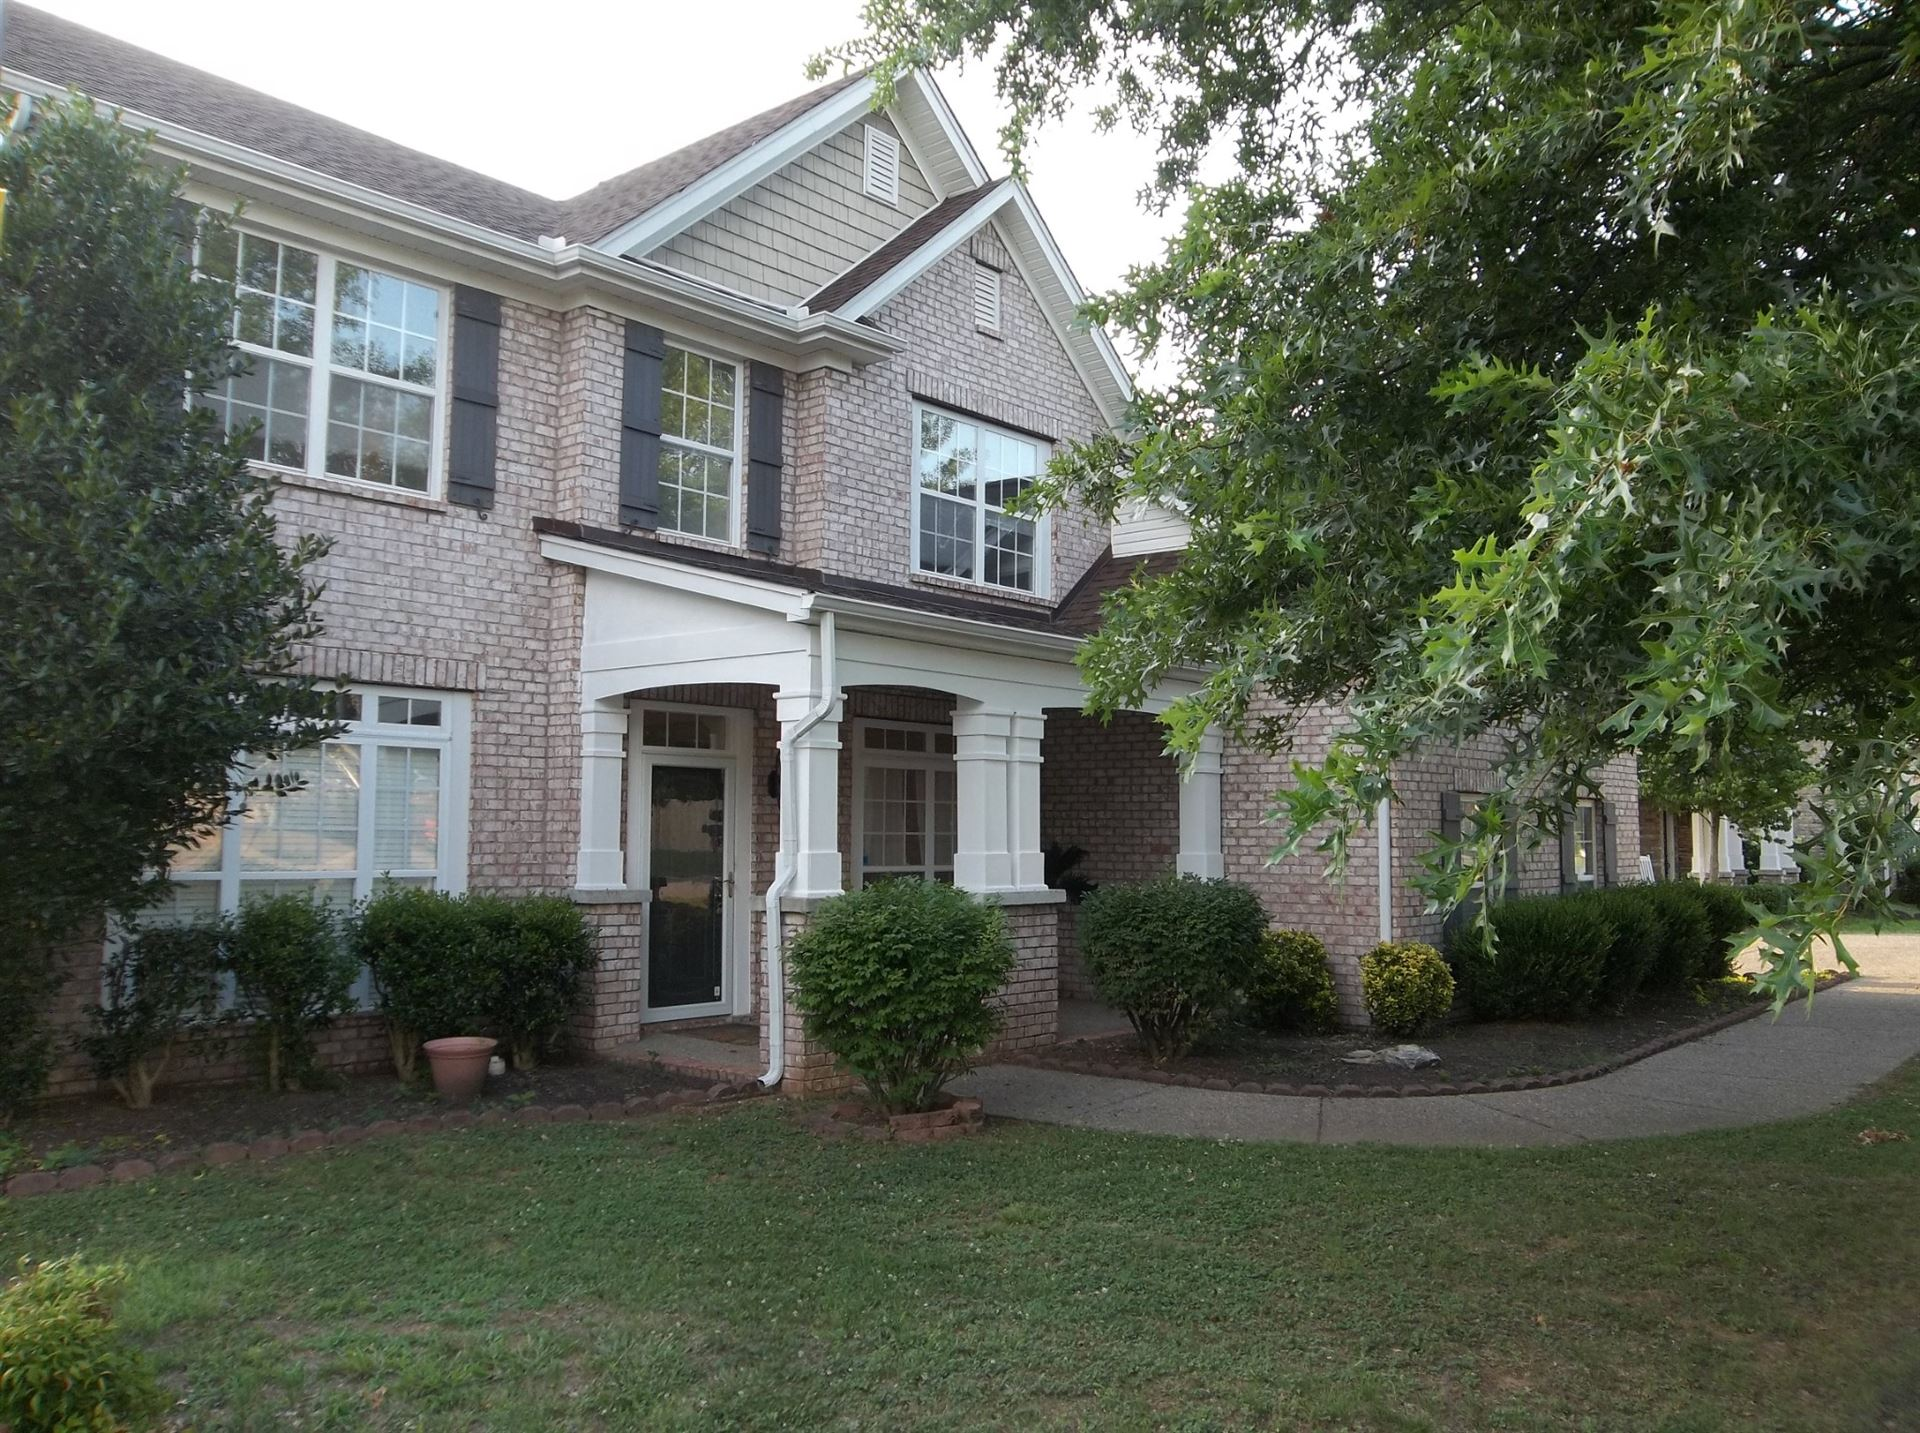 2113 Remington Park Rd, Old Hickory, TN 37138 - MLS#: 2169705